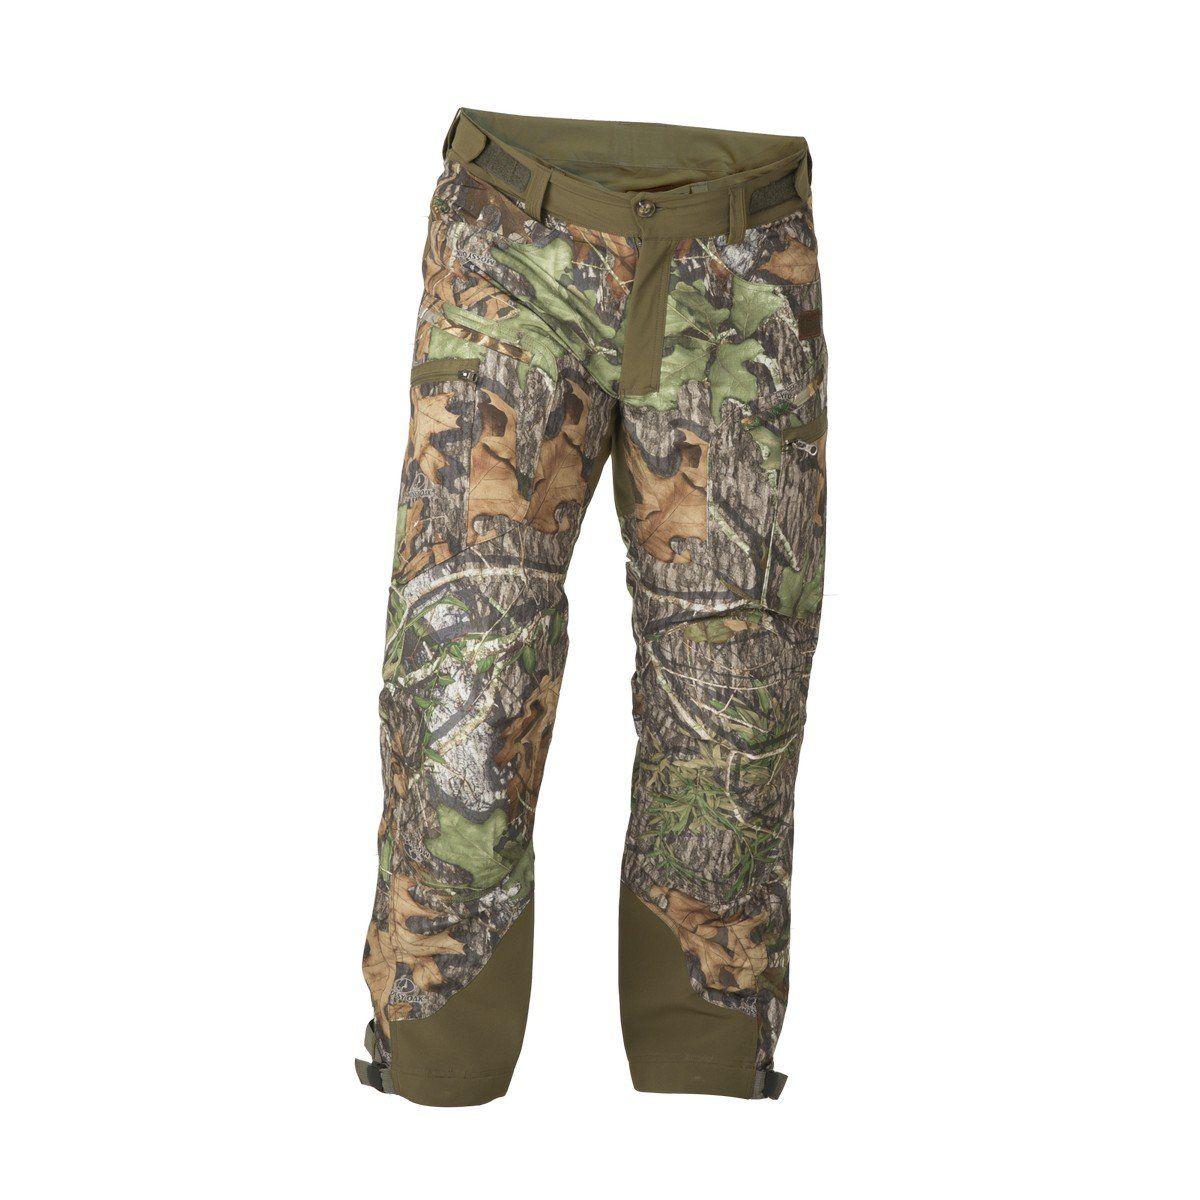 Banded Mw Hunting Pant Color Original Bottomland